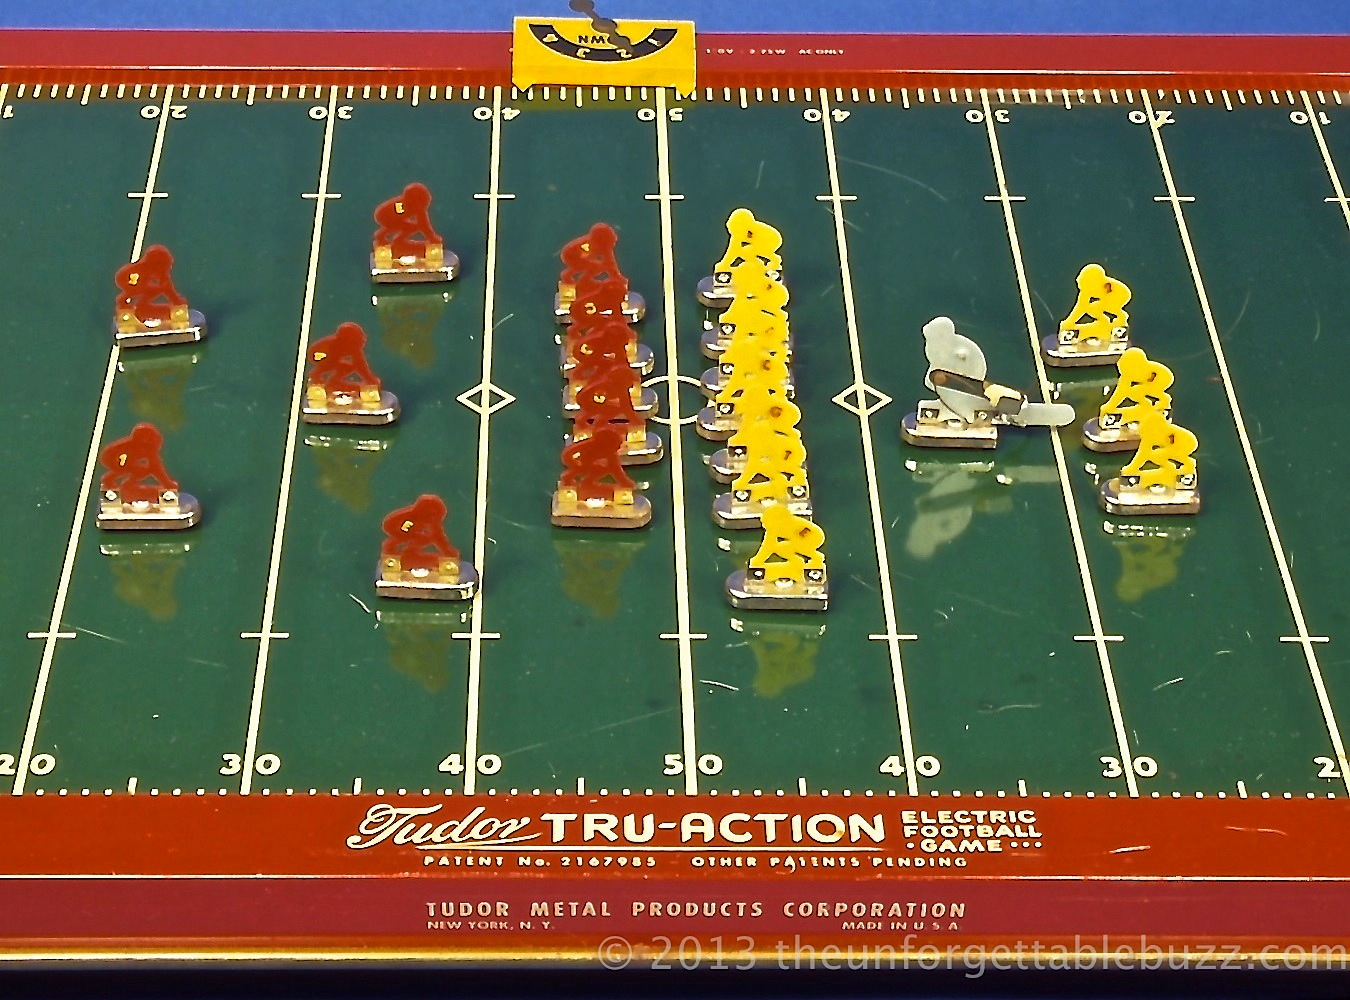 Tudor Electric Football Game